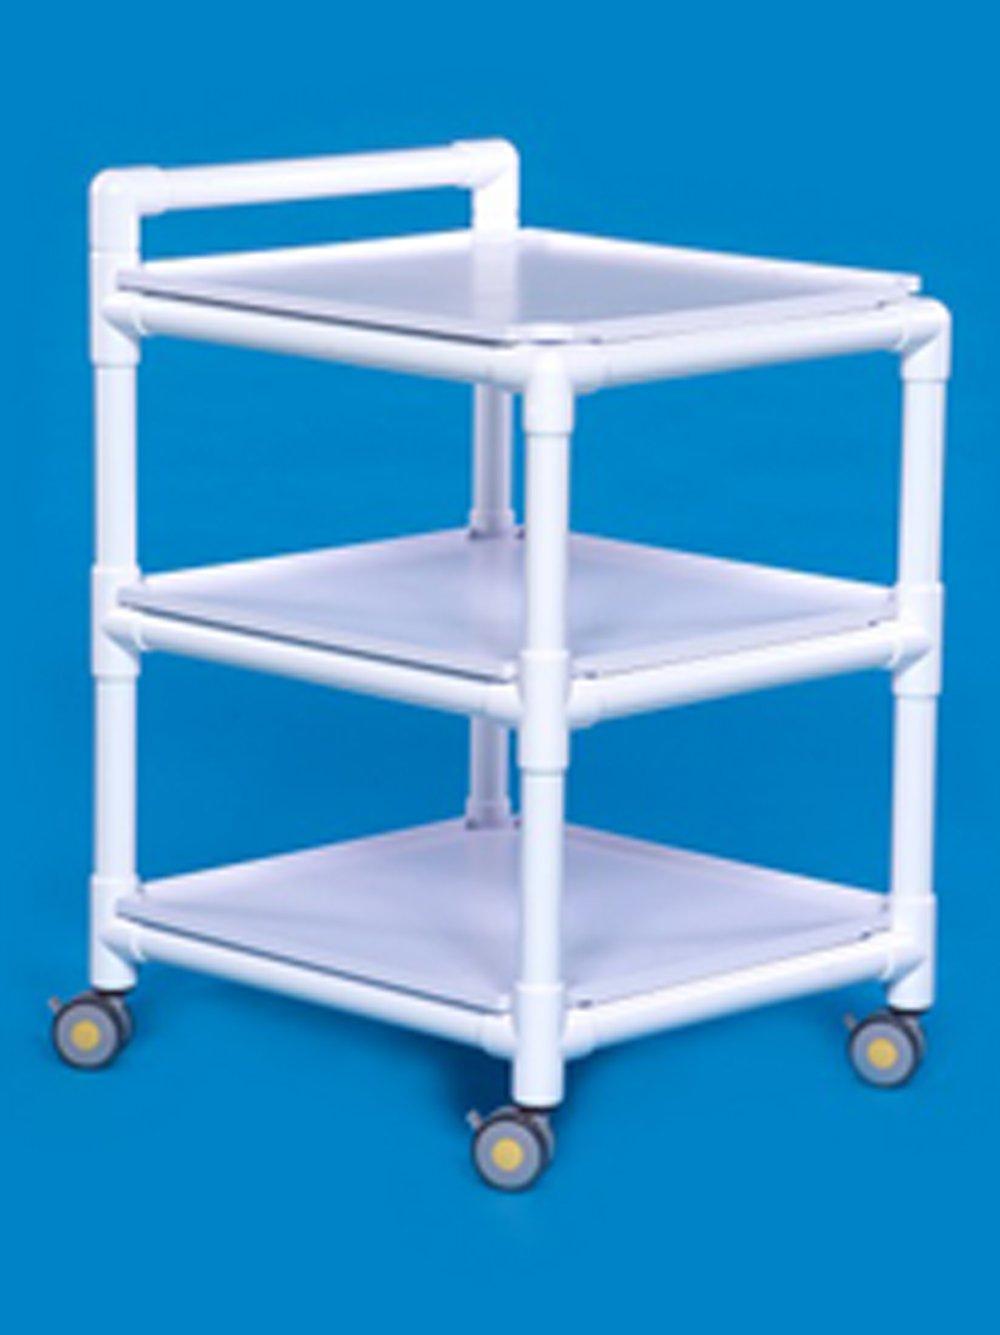 MRI Ranking Department store TOP8 Compatible Multi-Purpose MRI-MPC240 Cart IPU